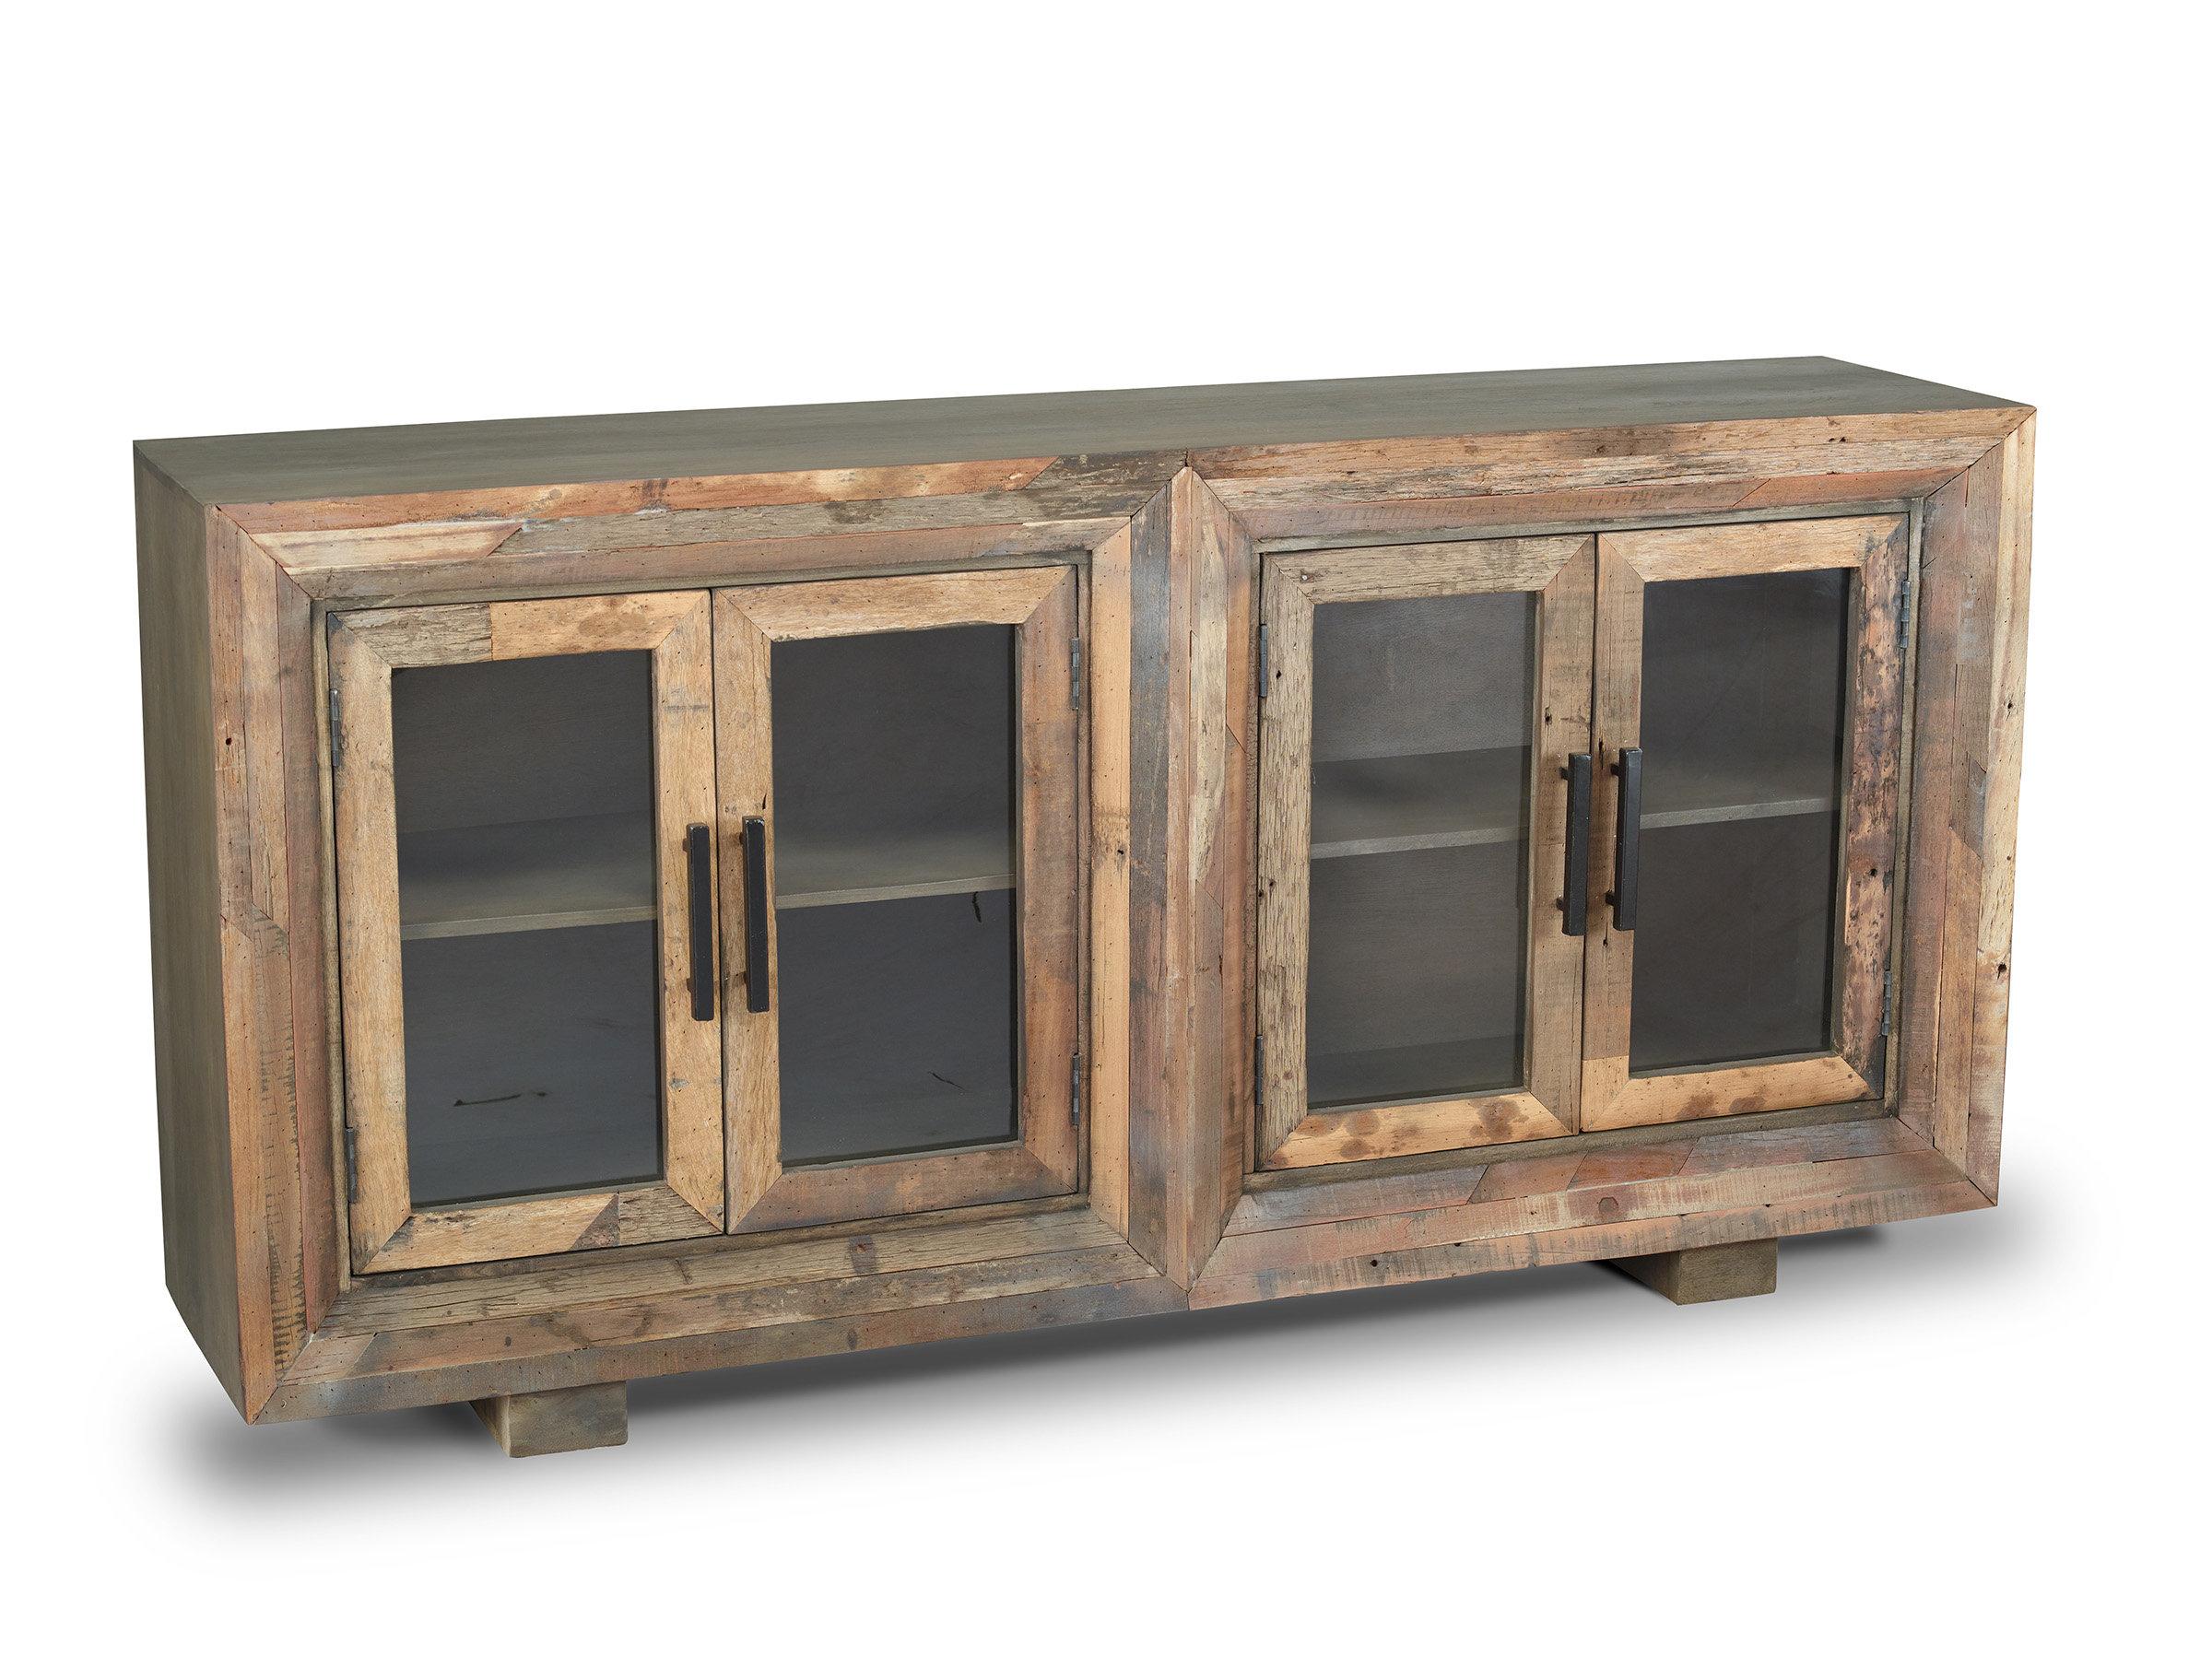 Widely Used Stennis Sideboards With Stender 4 Door Sideboard (Gallery 5 of 20)